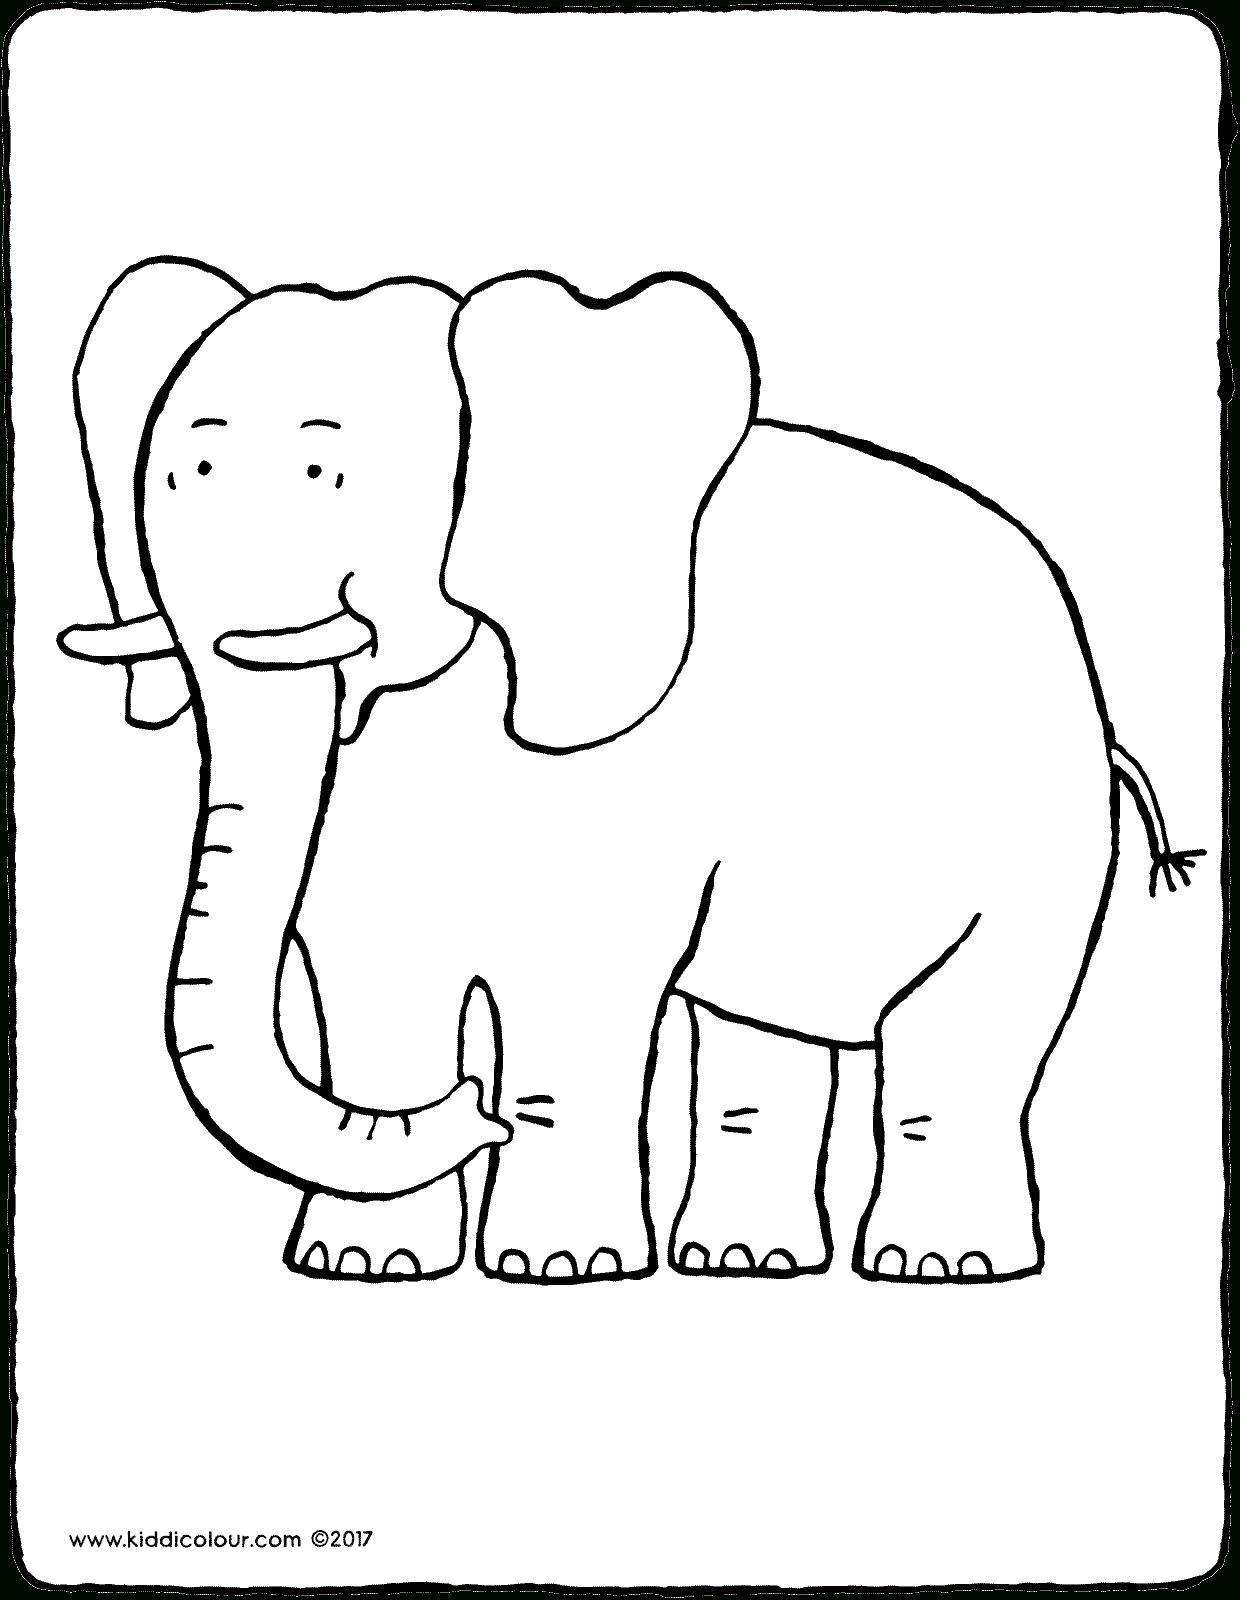 Elefant - Kiddimalseite ganzes Malvorlage Elefant